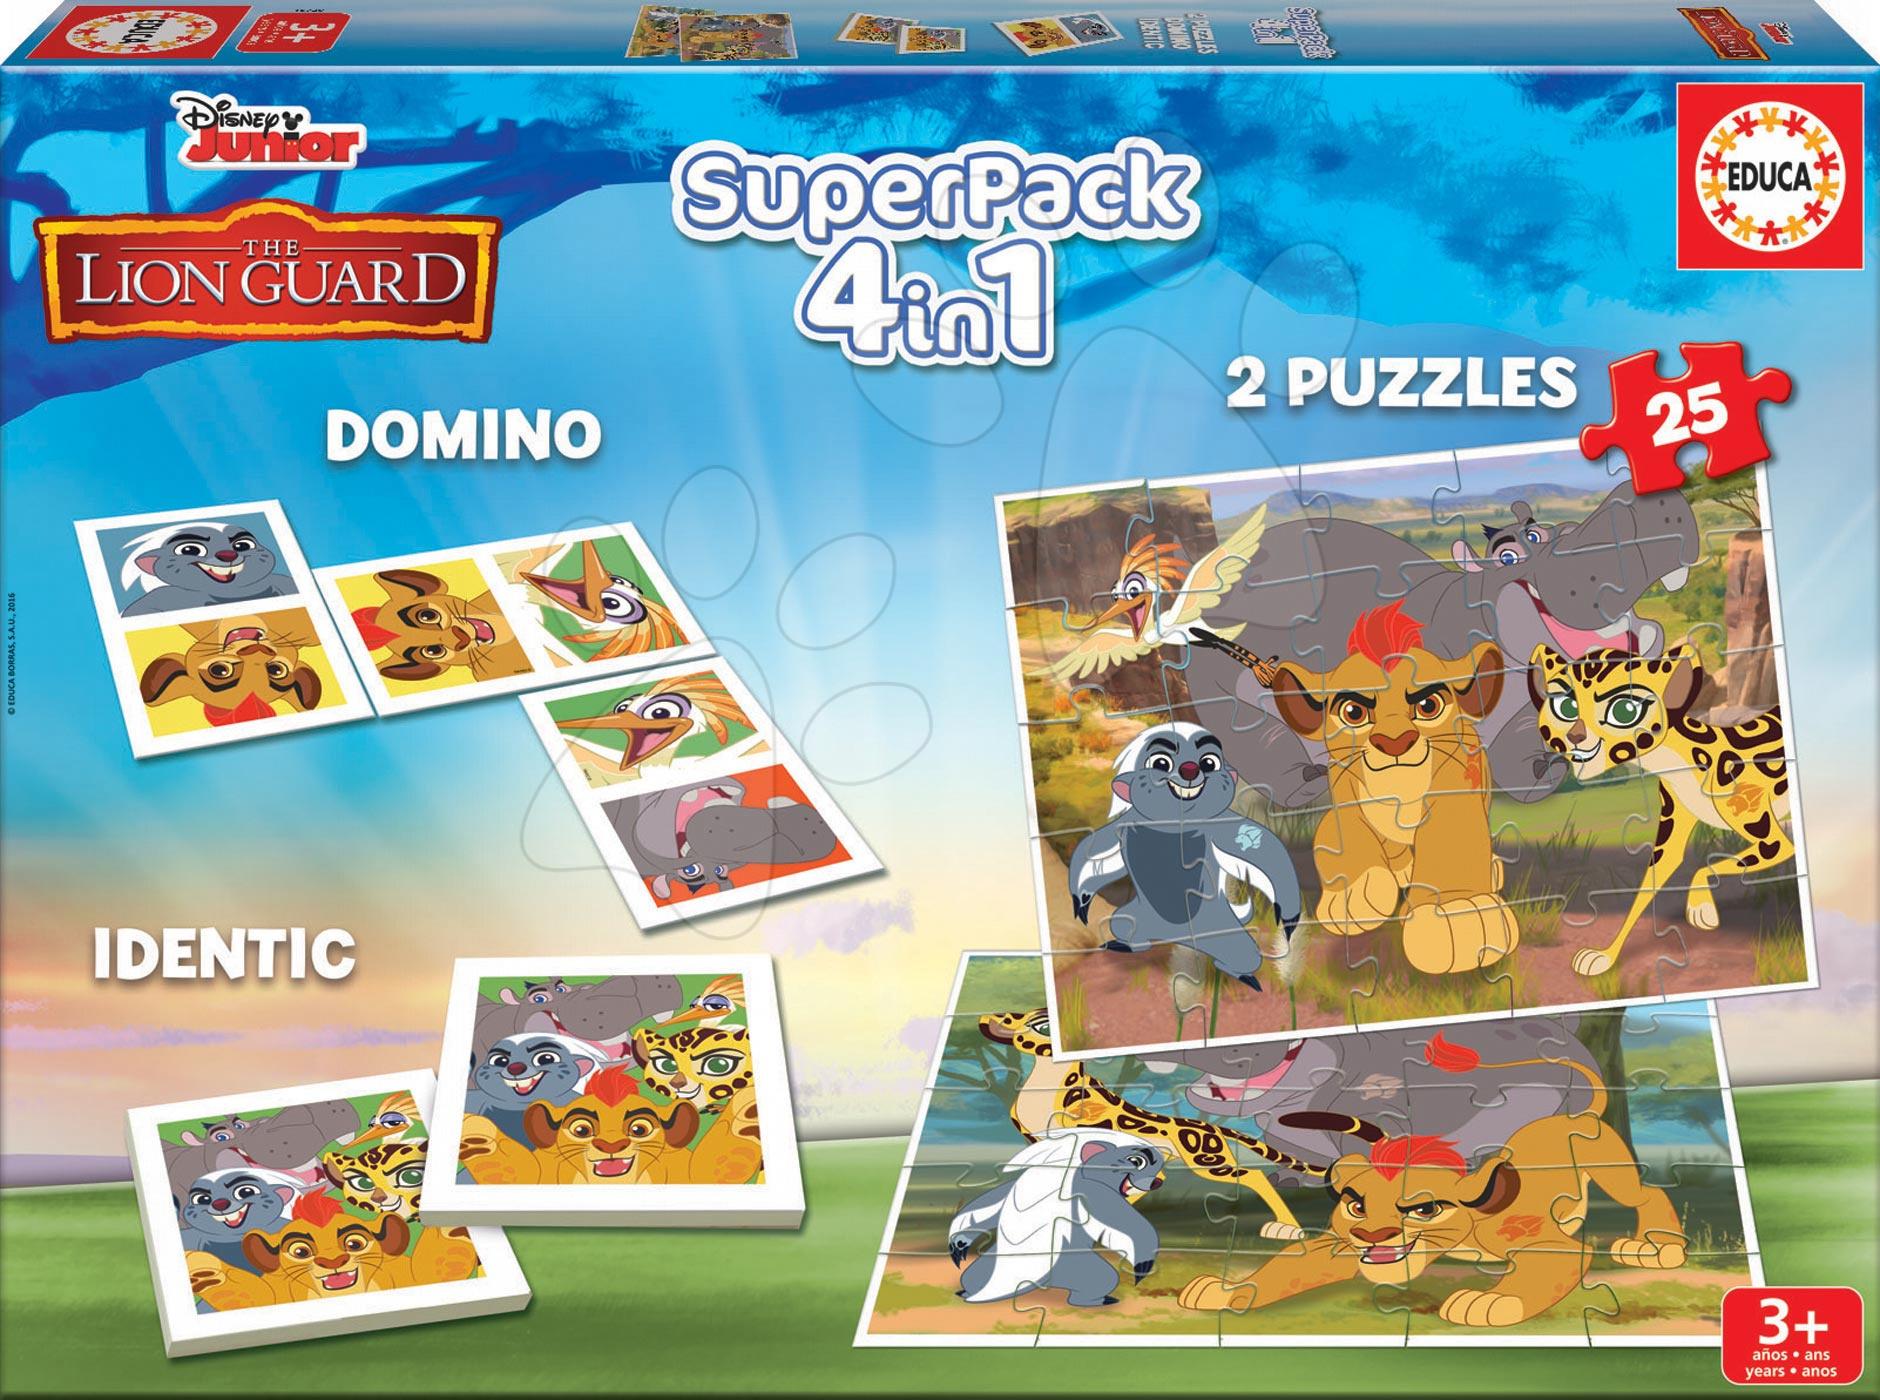 Puzzle Superpack Lví Král Disney 4v1Educa puzzle, domino a pexesso